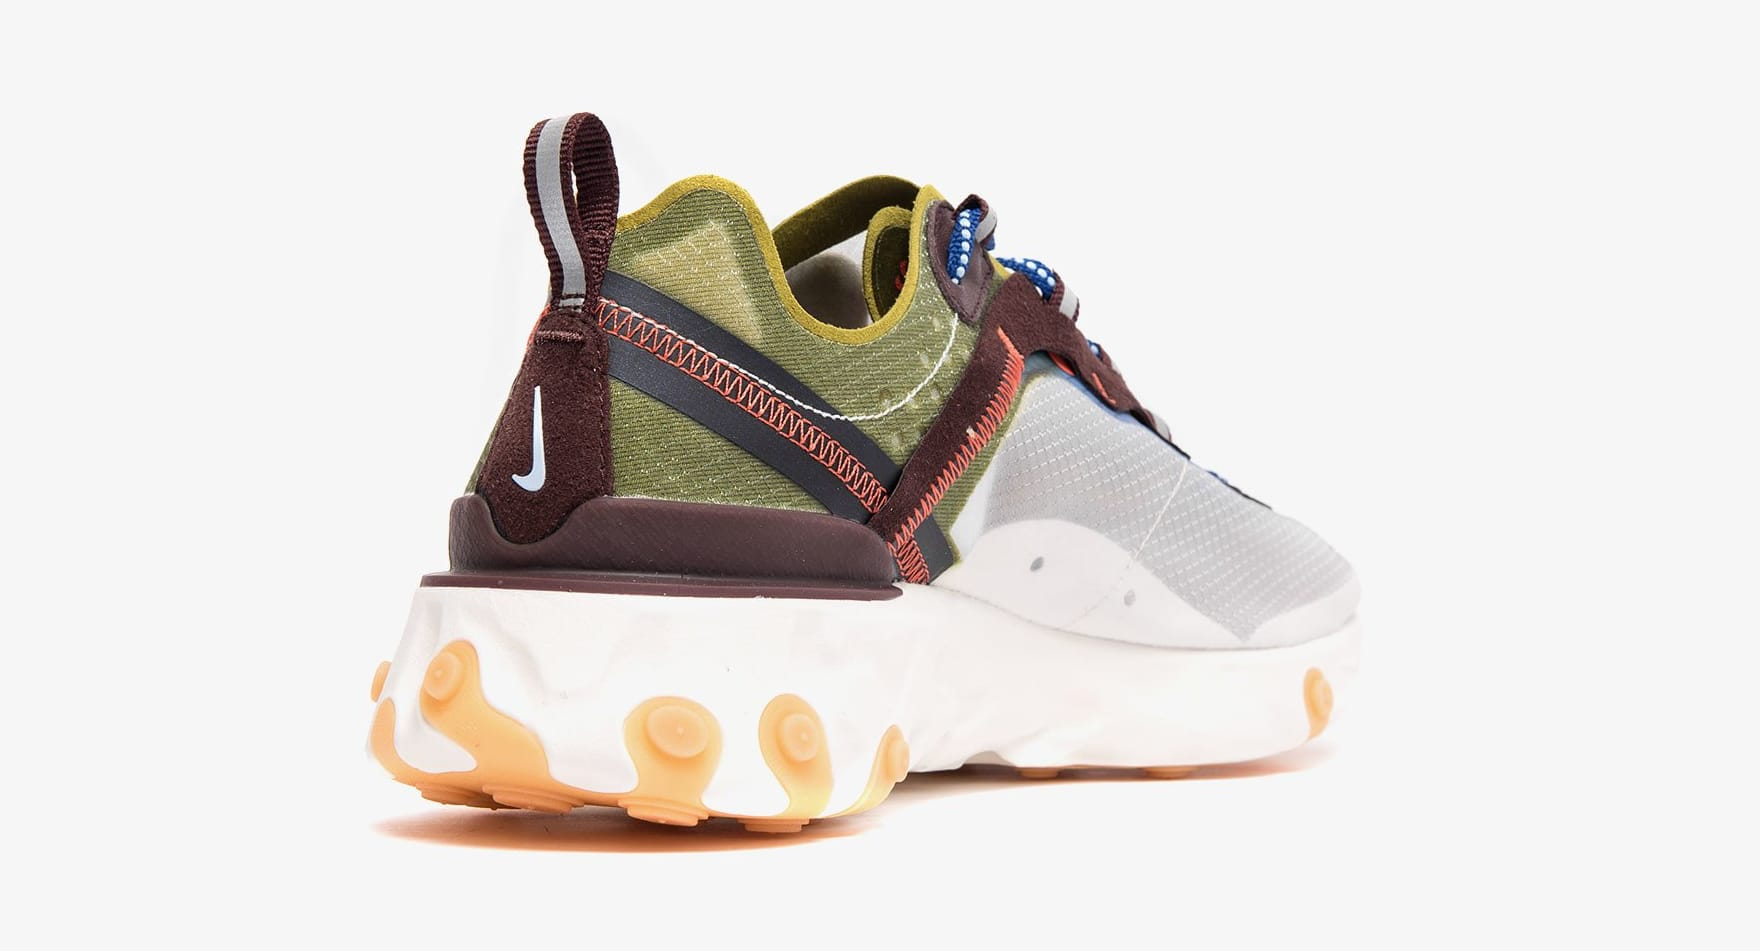 Nike React Element 87 AQ1090-300 (Heel)